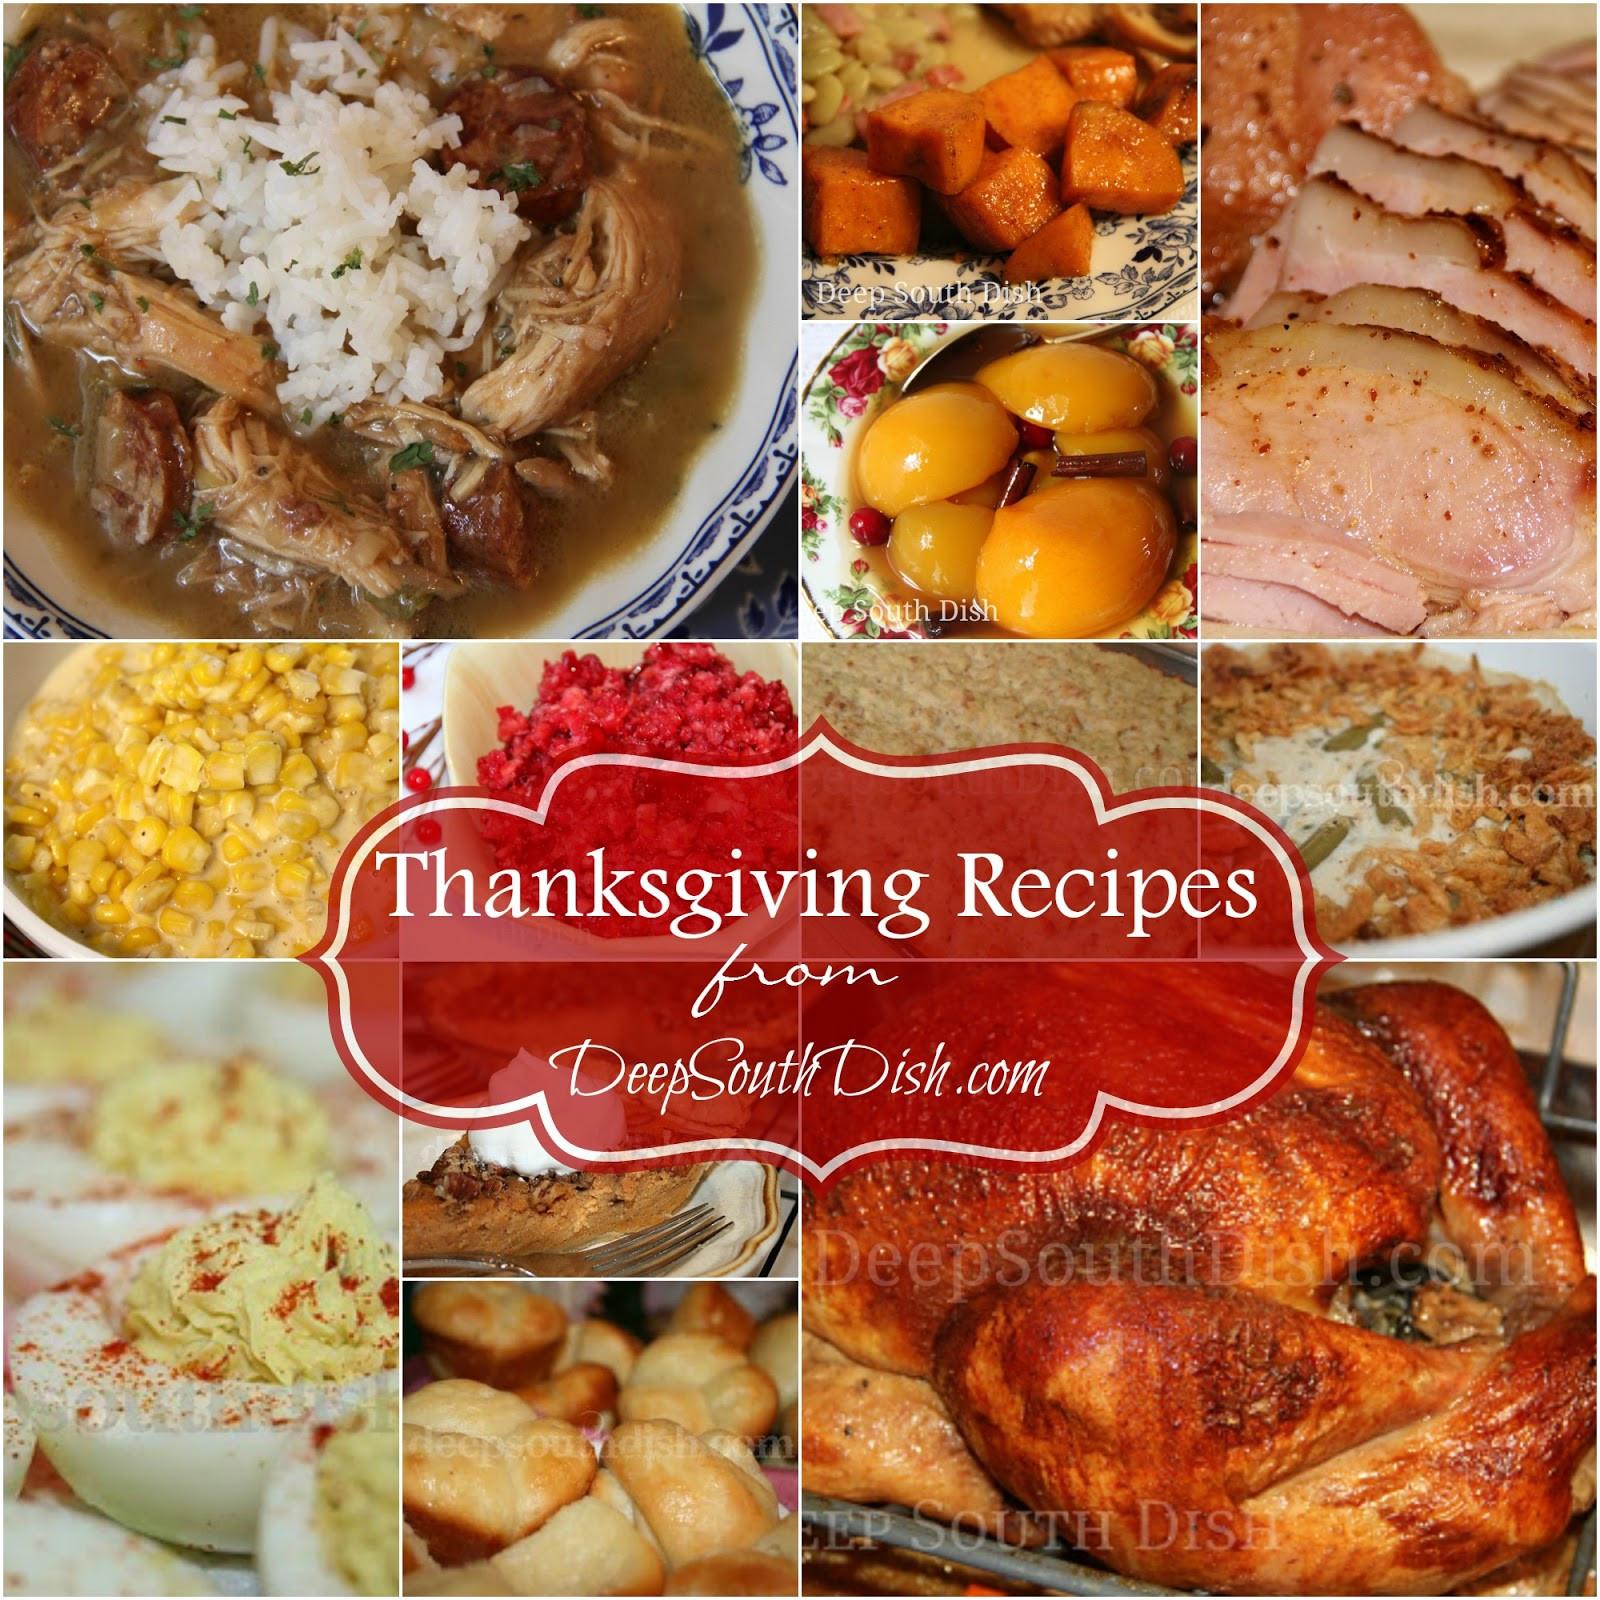 Soul Food Christmas Dinner Menu  Deep South Dish Deep South Southern Thanksgiving Recipes